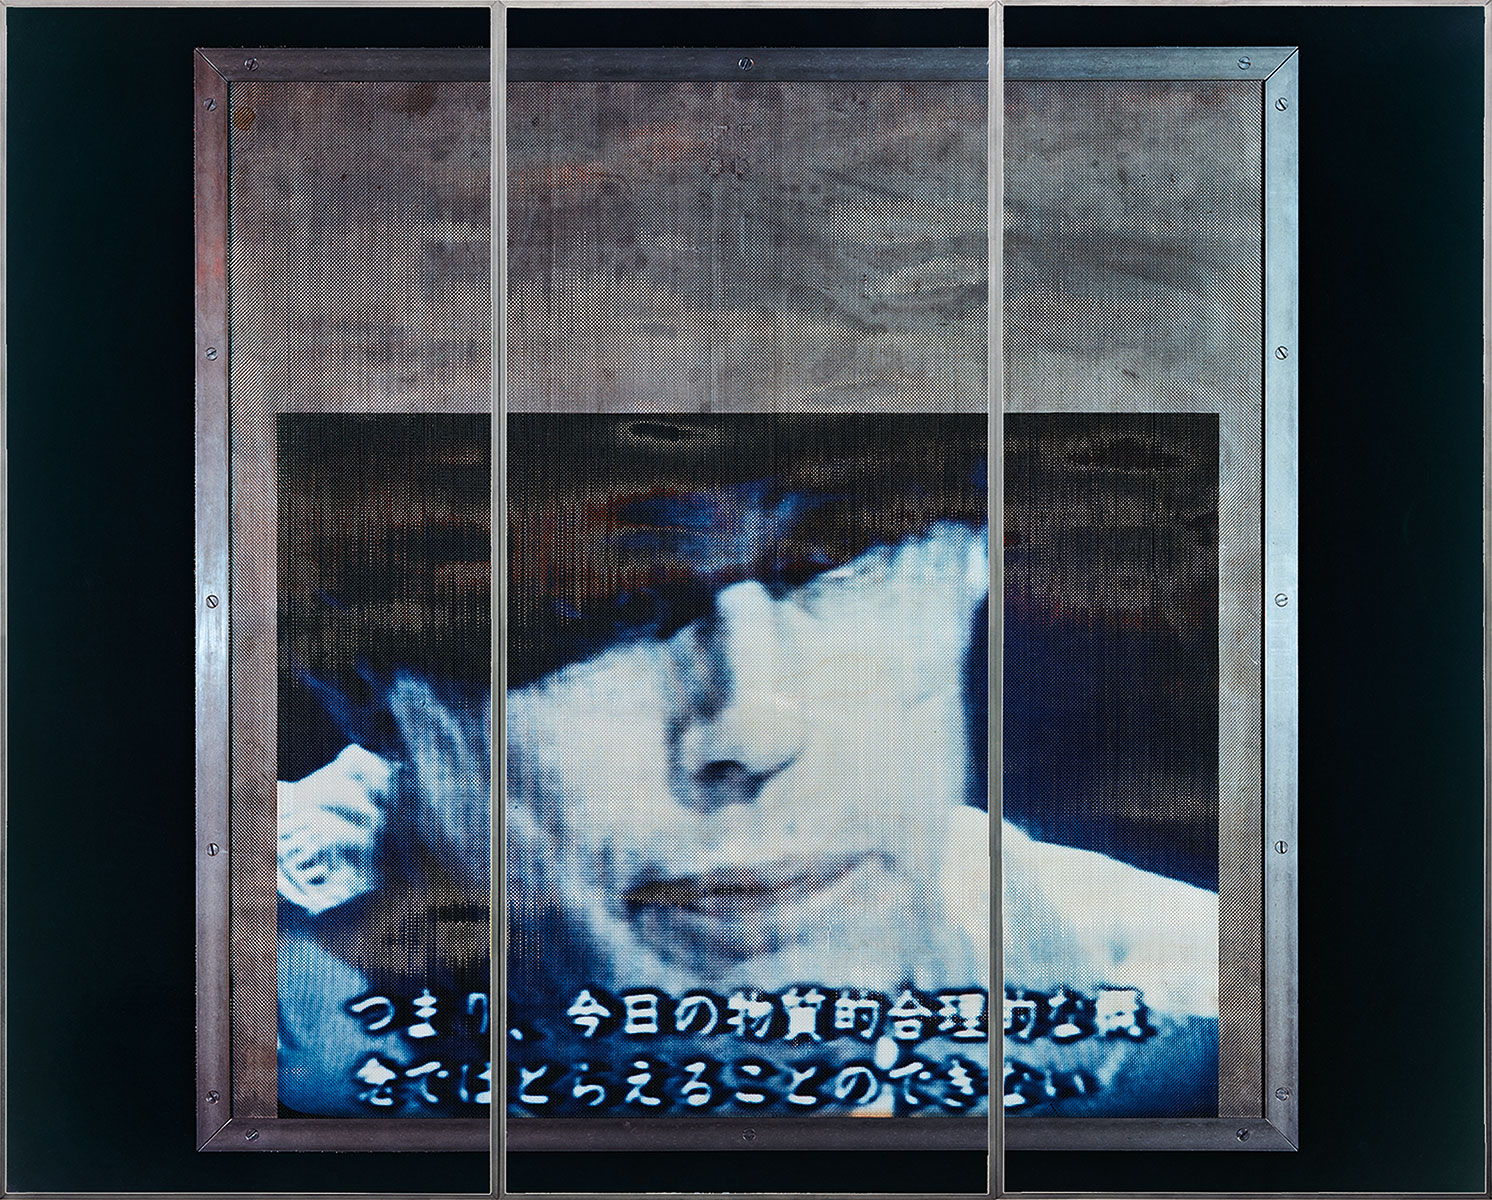 Katharina Sieverding, Kontinentalkern IV, 1986/2014, 300 × 375 cm, 3-teilig, je 300 × 125 cm; Stiftung Museum Schloss Moyland